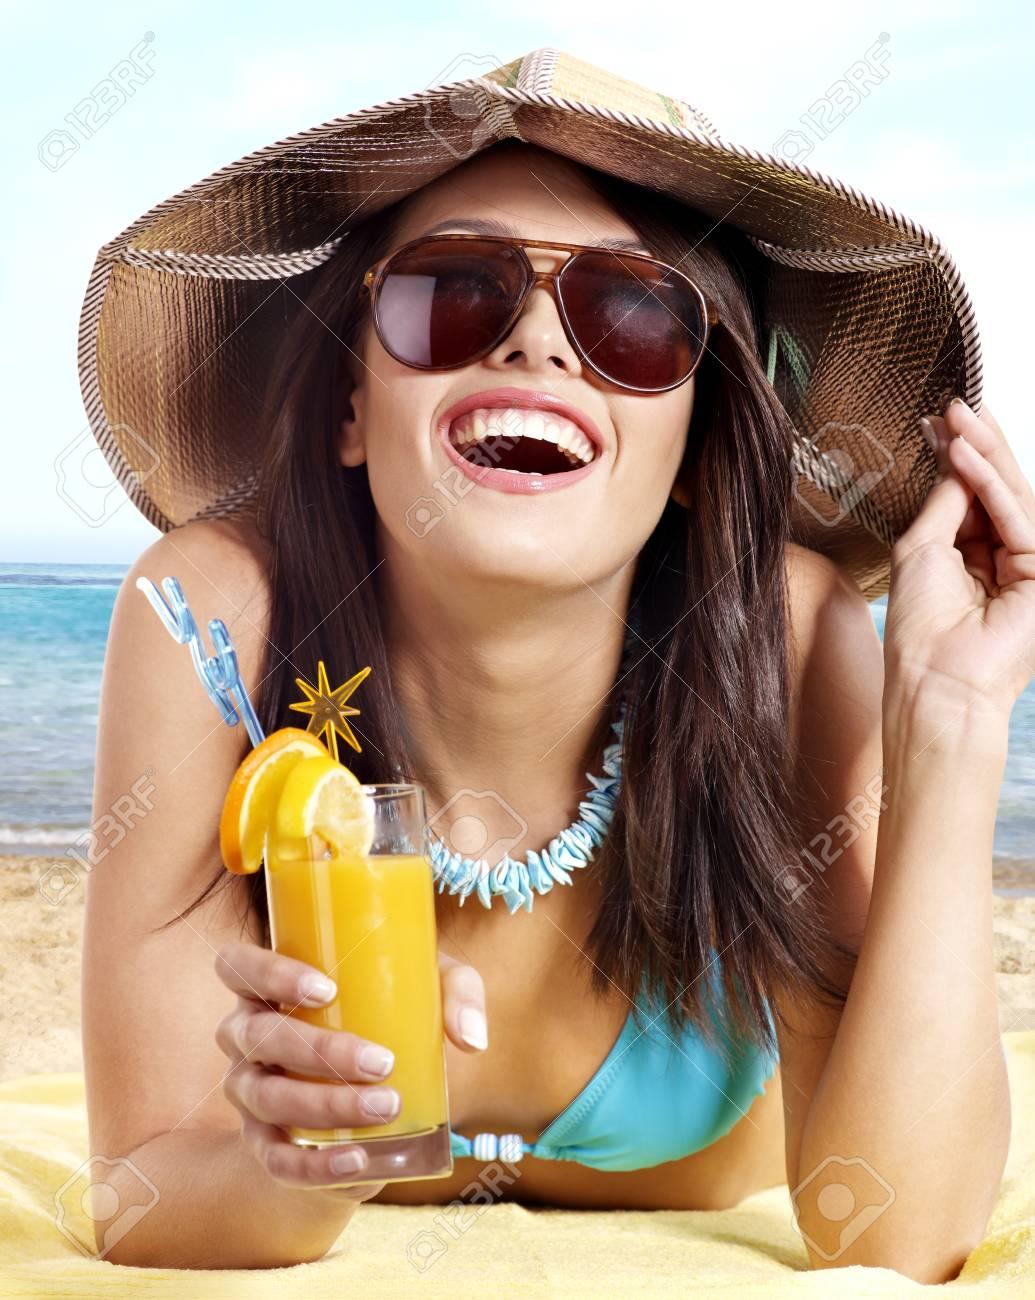 Young woman in bikini on beach drinking cocktail. Stock Photo - 17753912